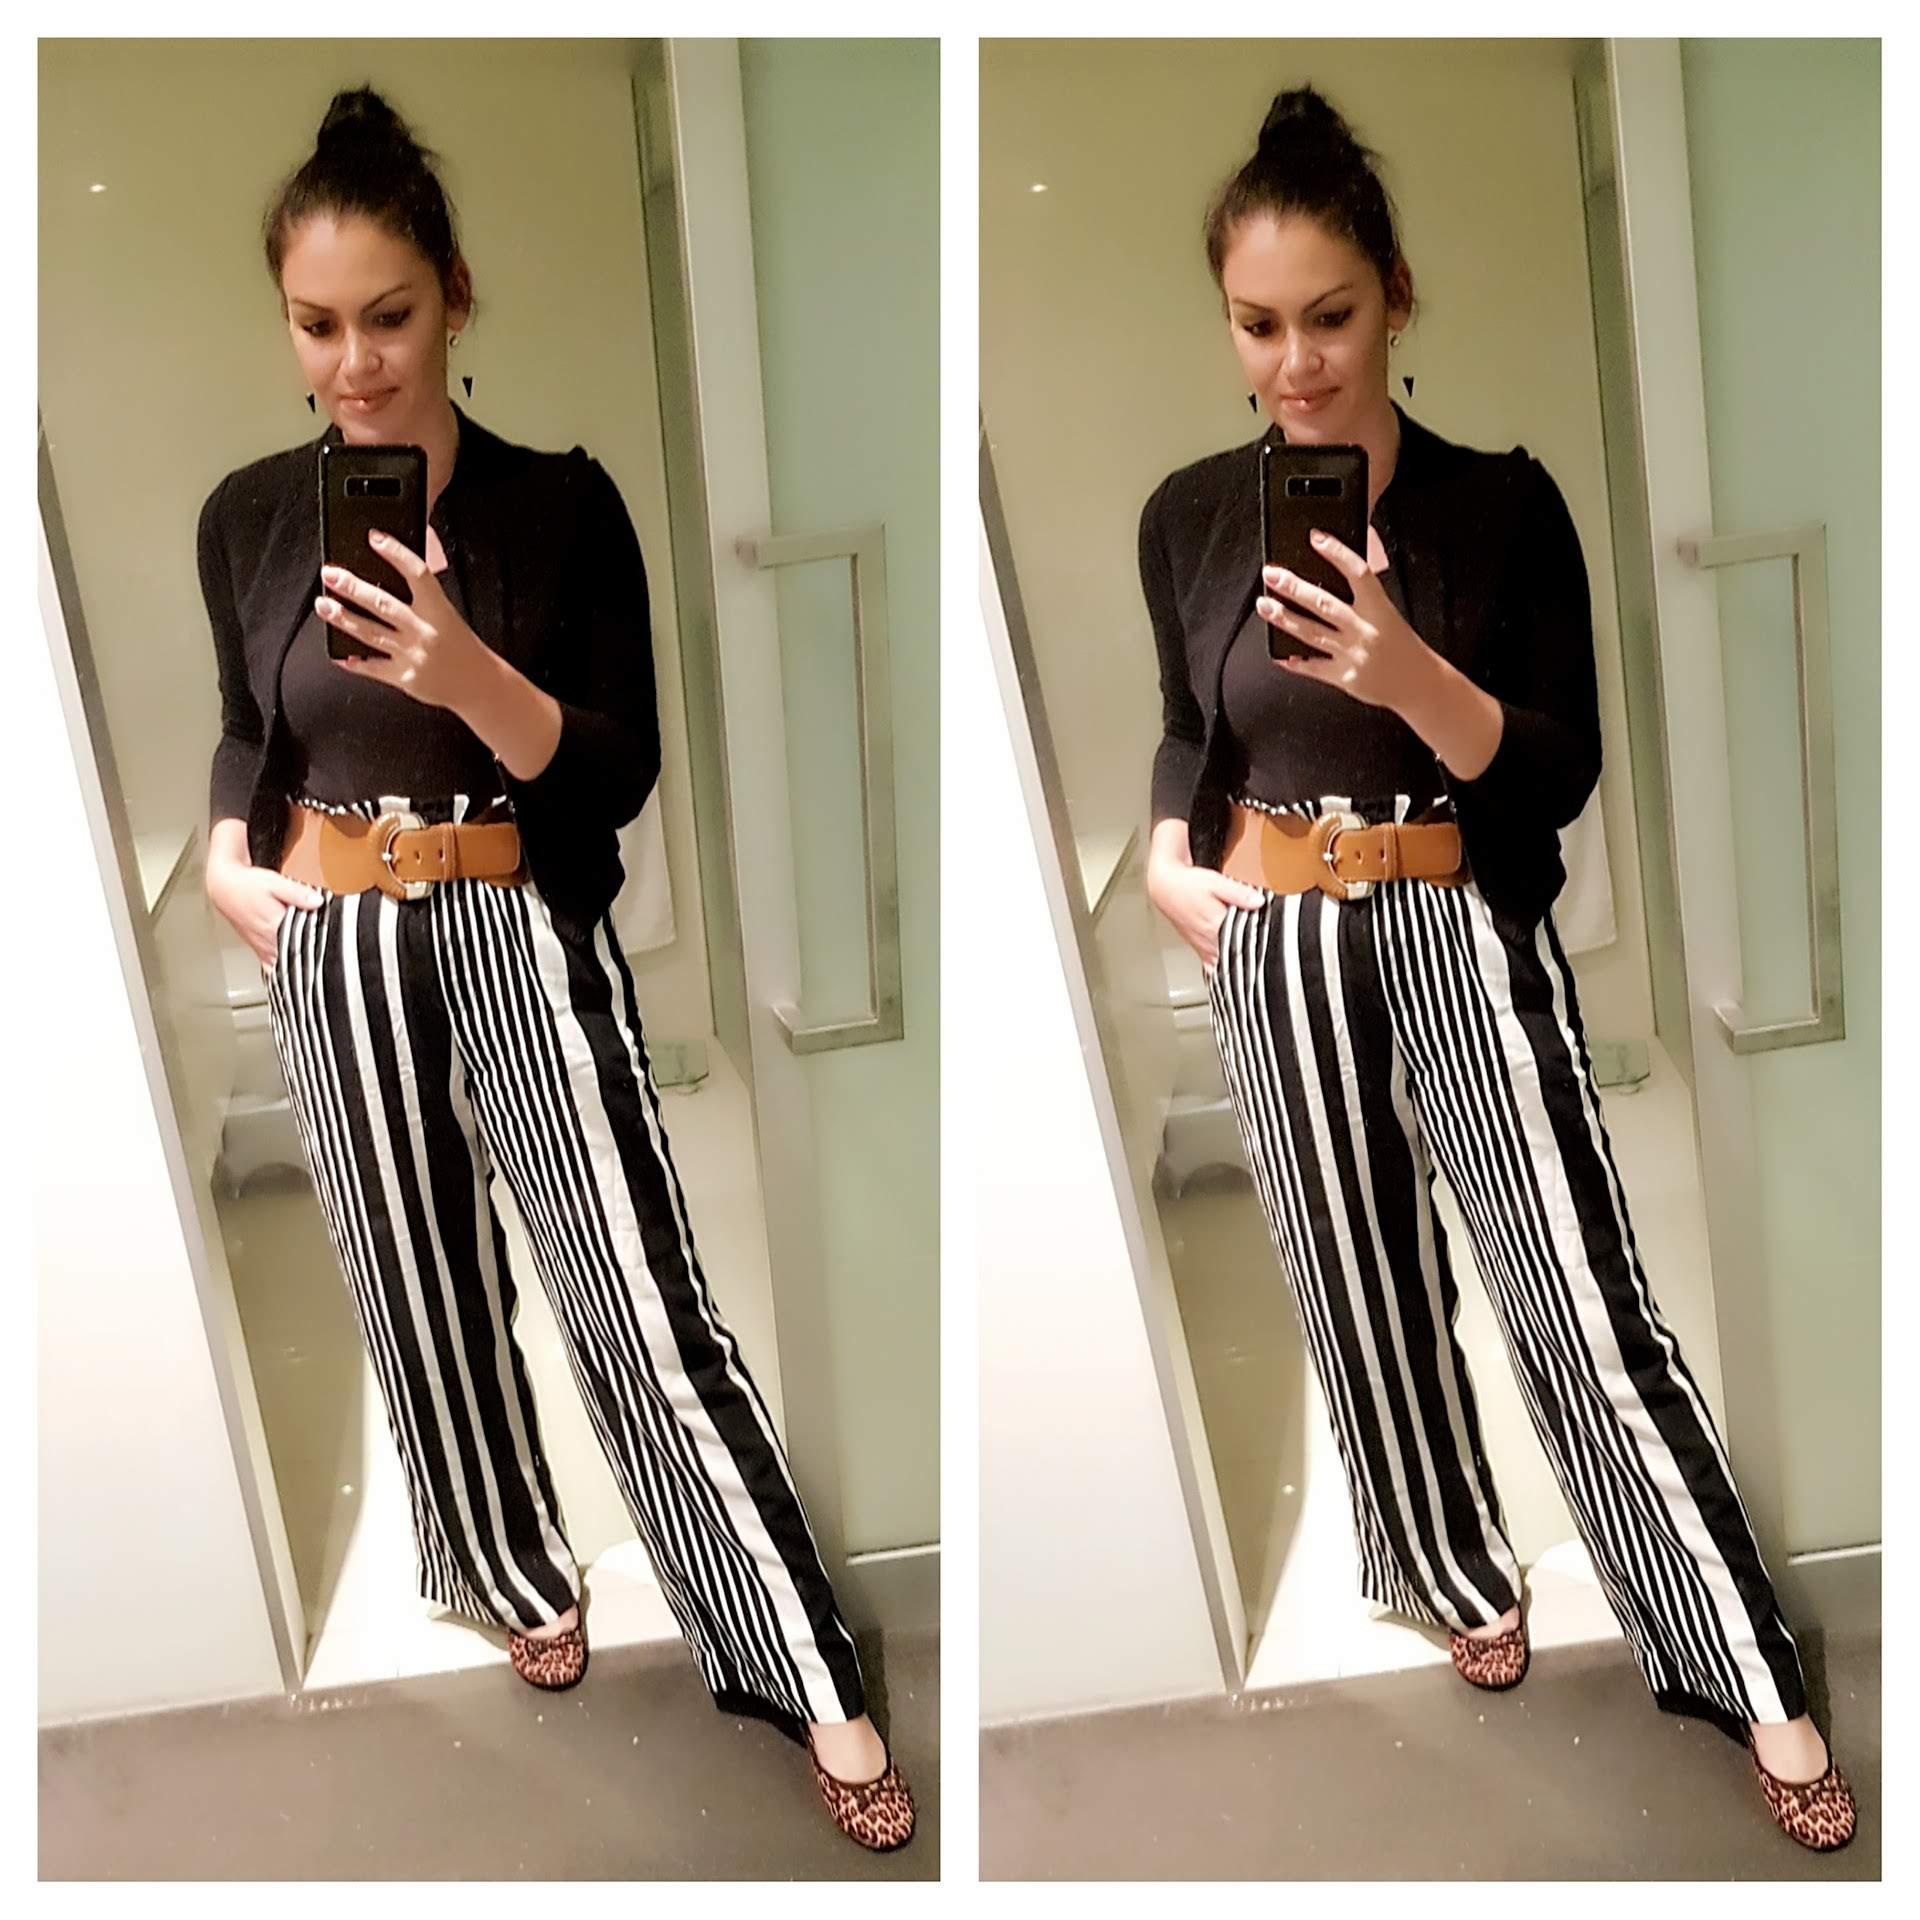 samantha clark waters fashion lifestyle blog level up style personality creative